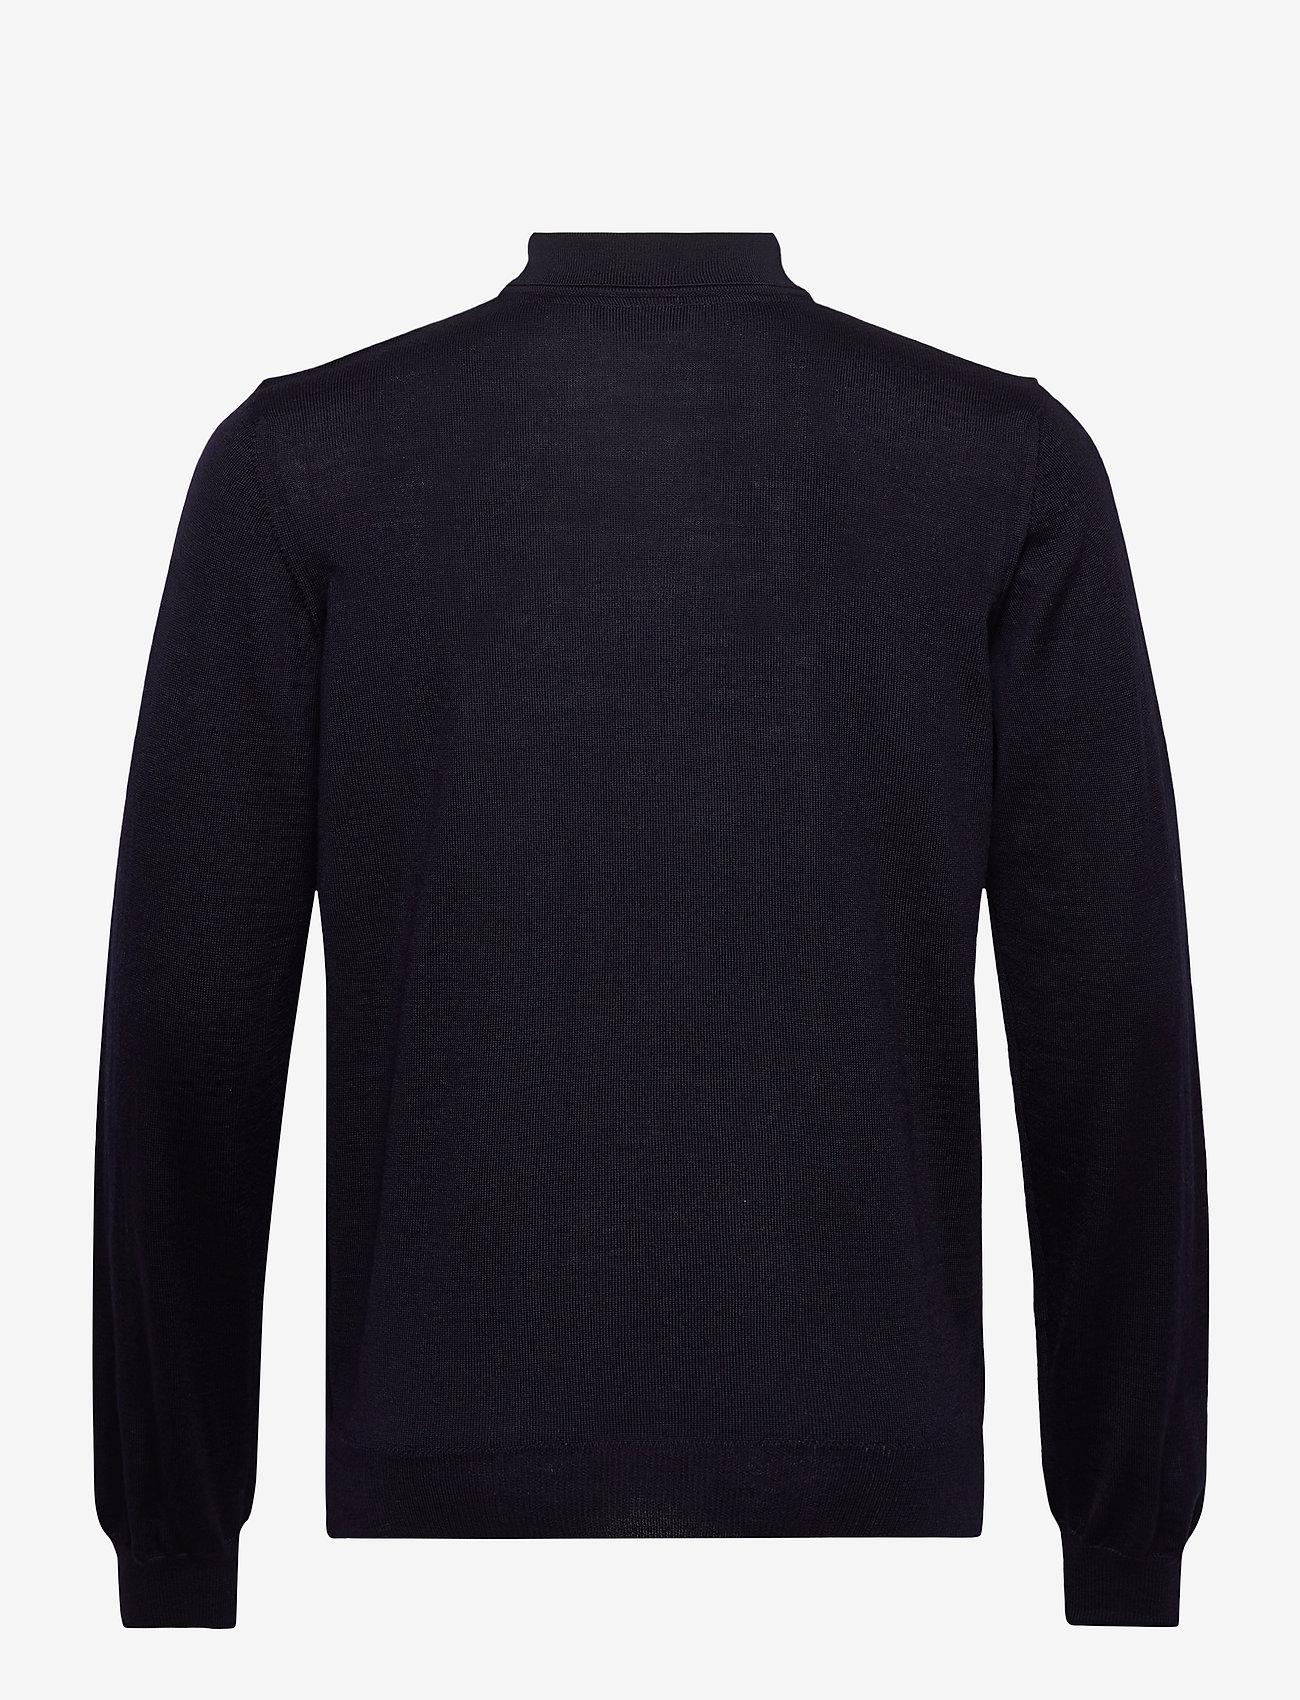 SAND - Merino Embroidery - IPolo - långärmade pikéer - dark blue/navy - 1